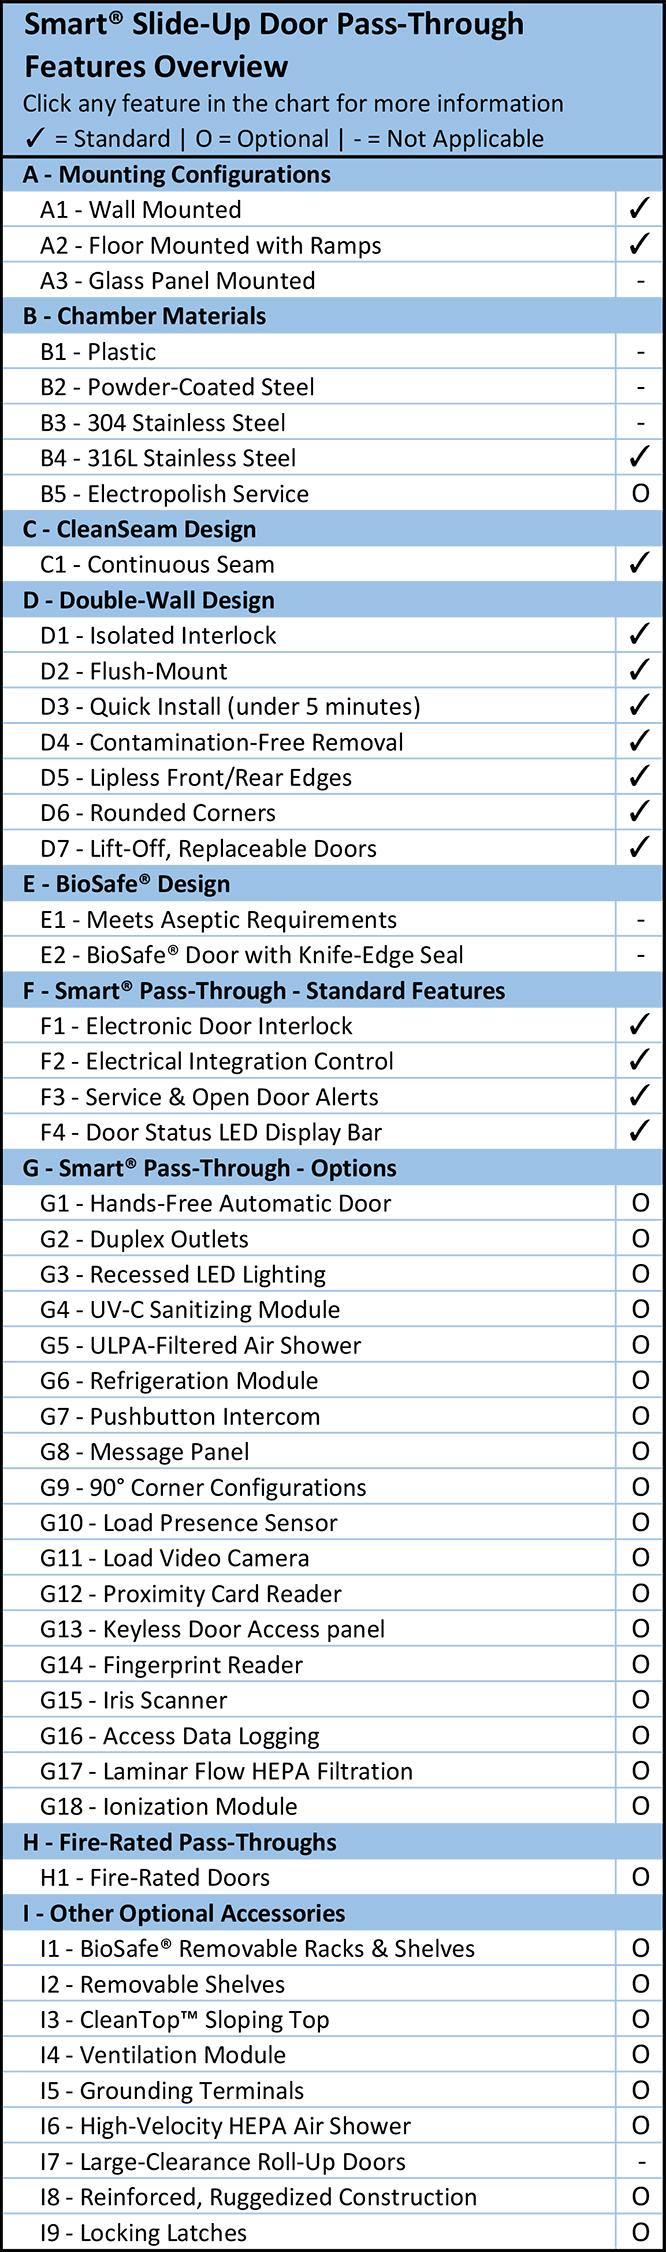 Smart® Slide-Up Door Pass-Through Feature Overview Chart